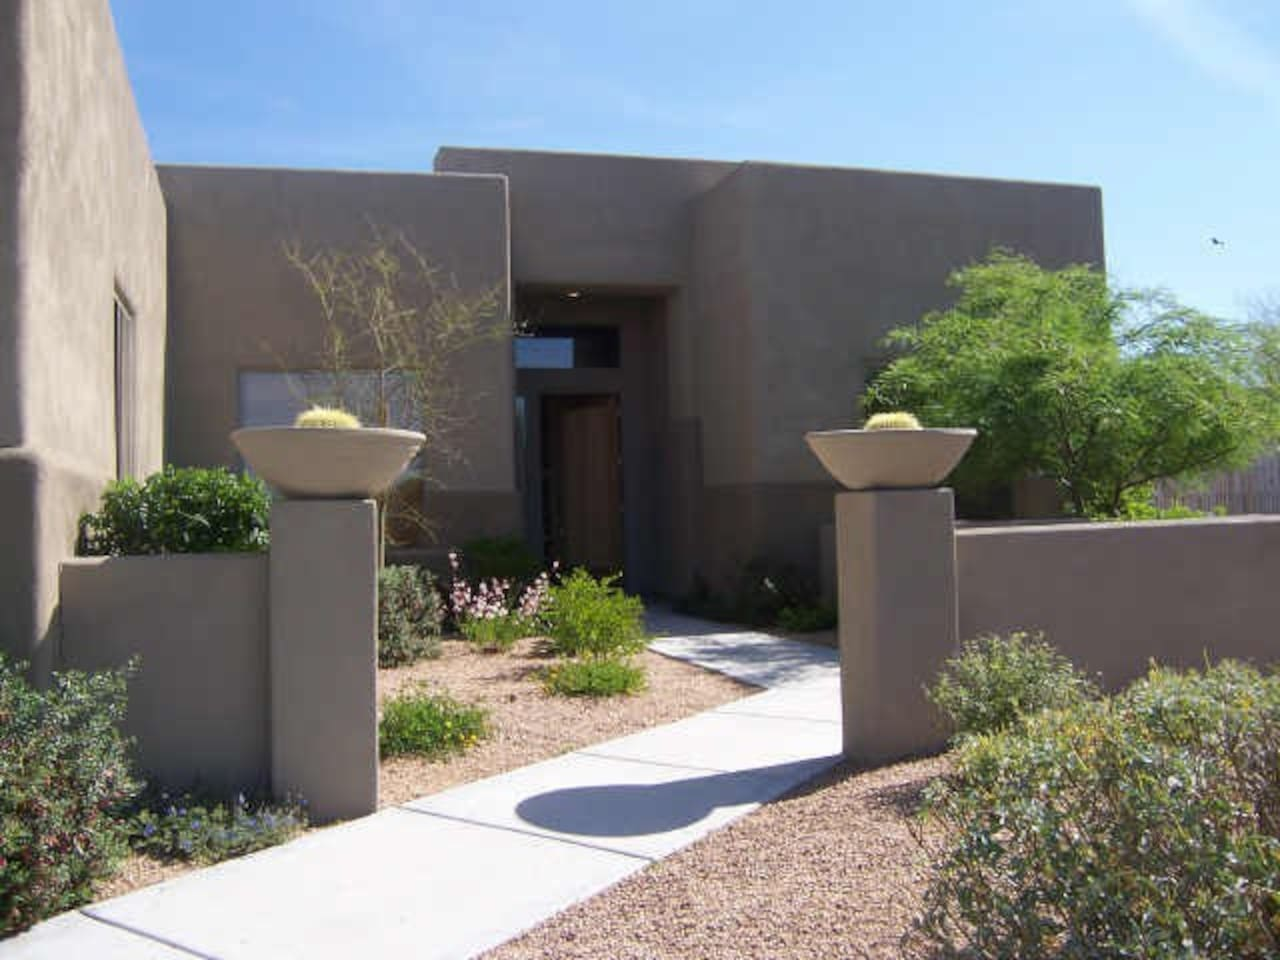 A classic desert territorial style beautiful designer home